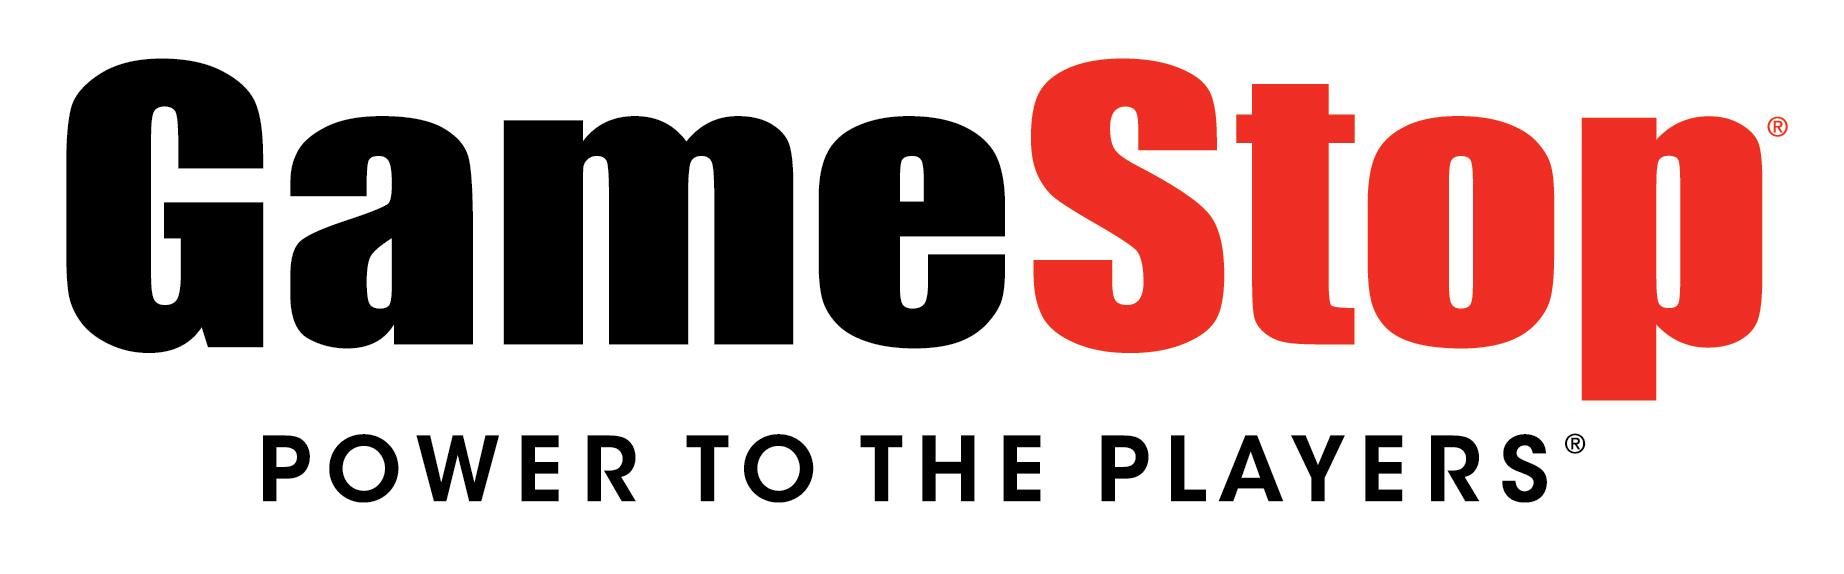 gamestop Archives - Cheats co